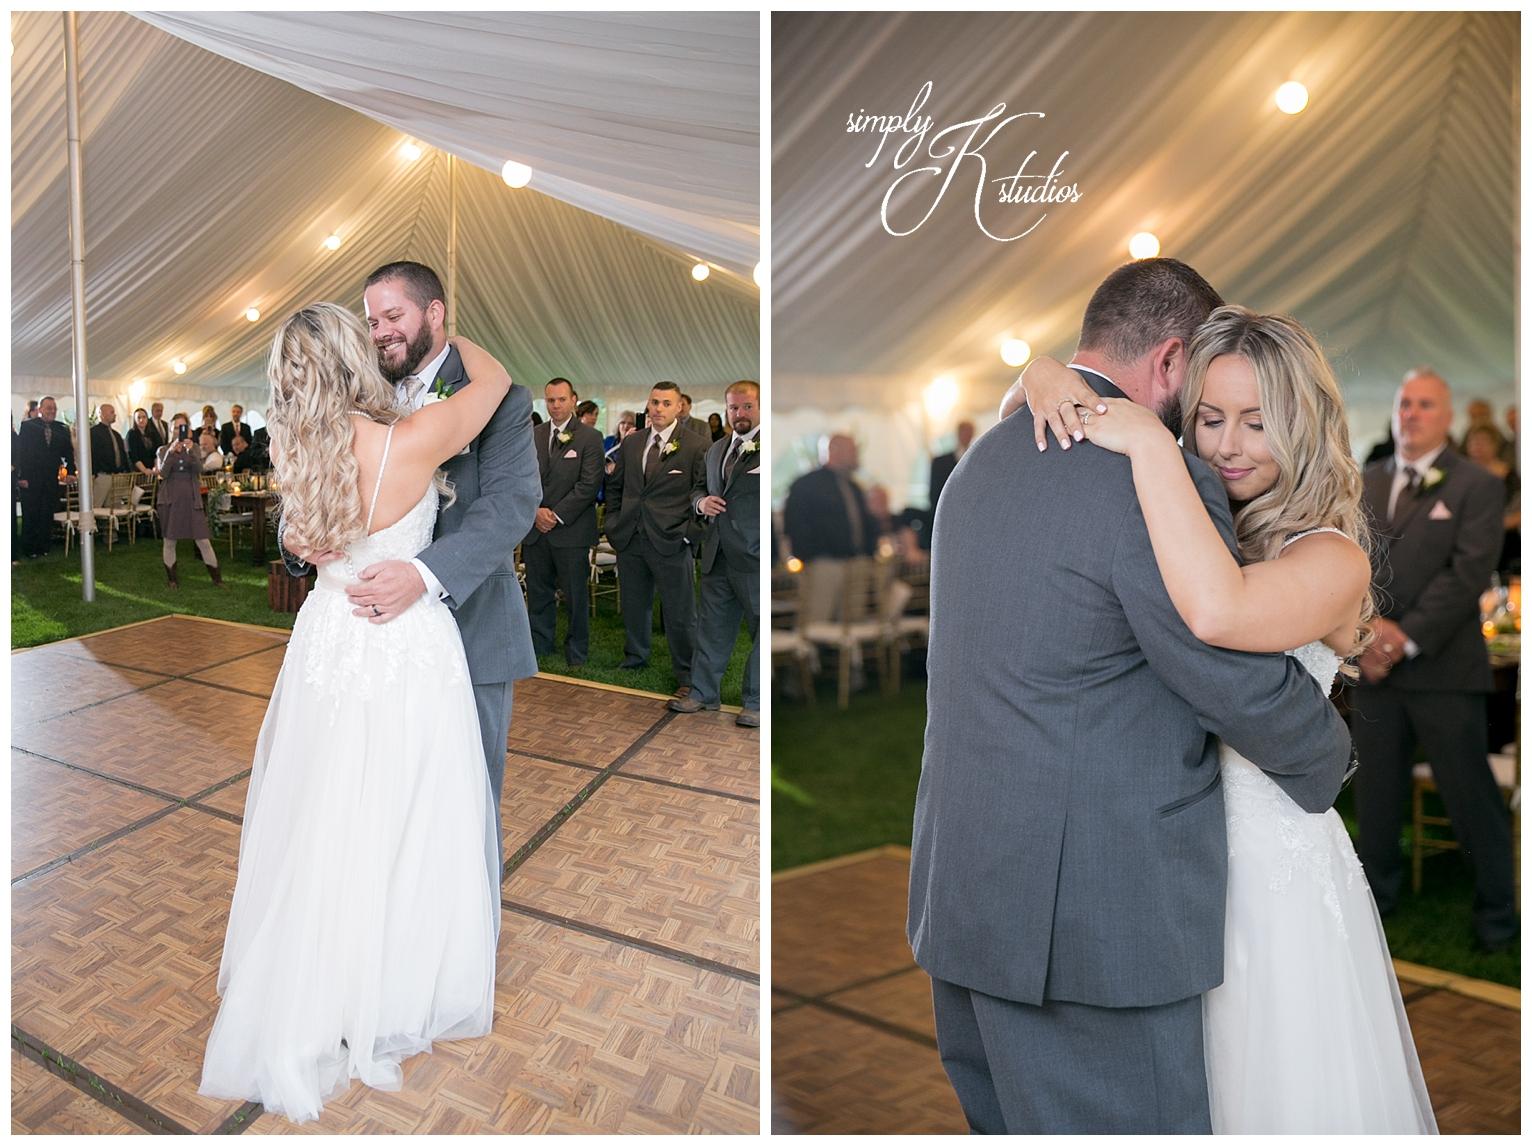 Backyard Weddings in CT.jpg